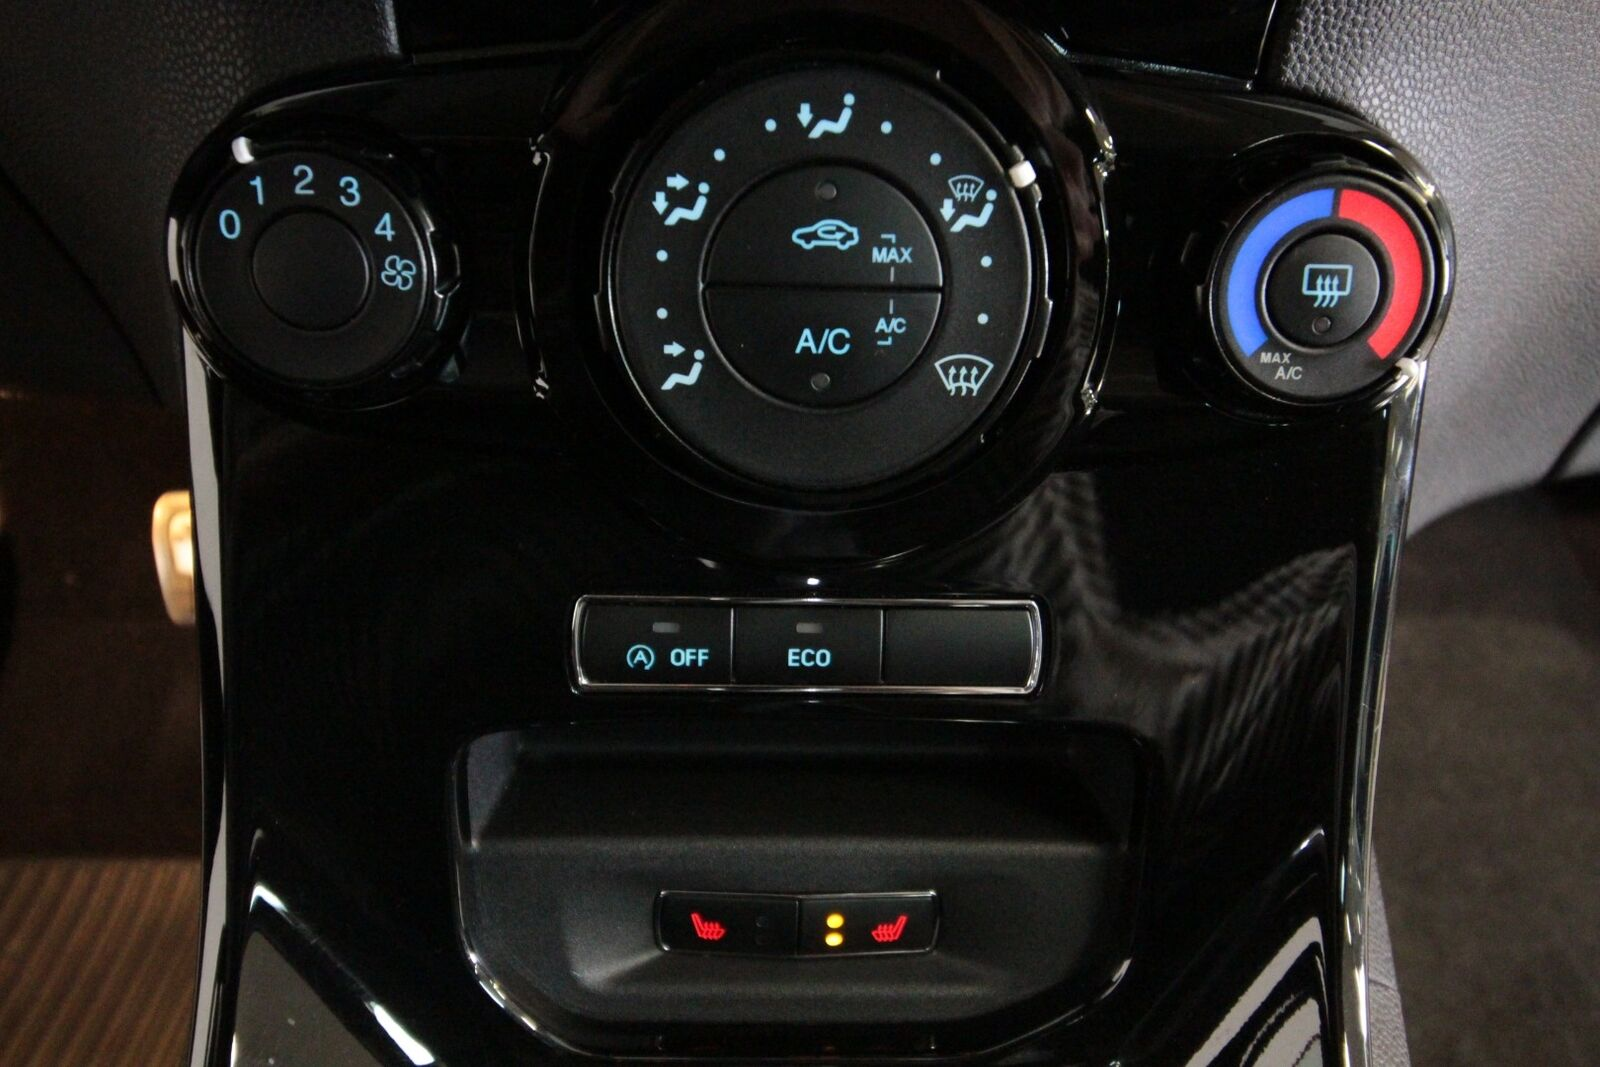 Ford Fiesta SCTi 125 Titanium